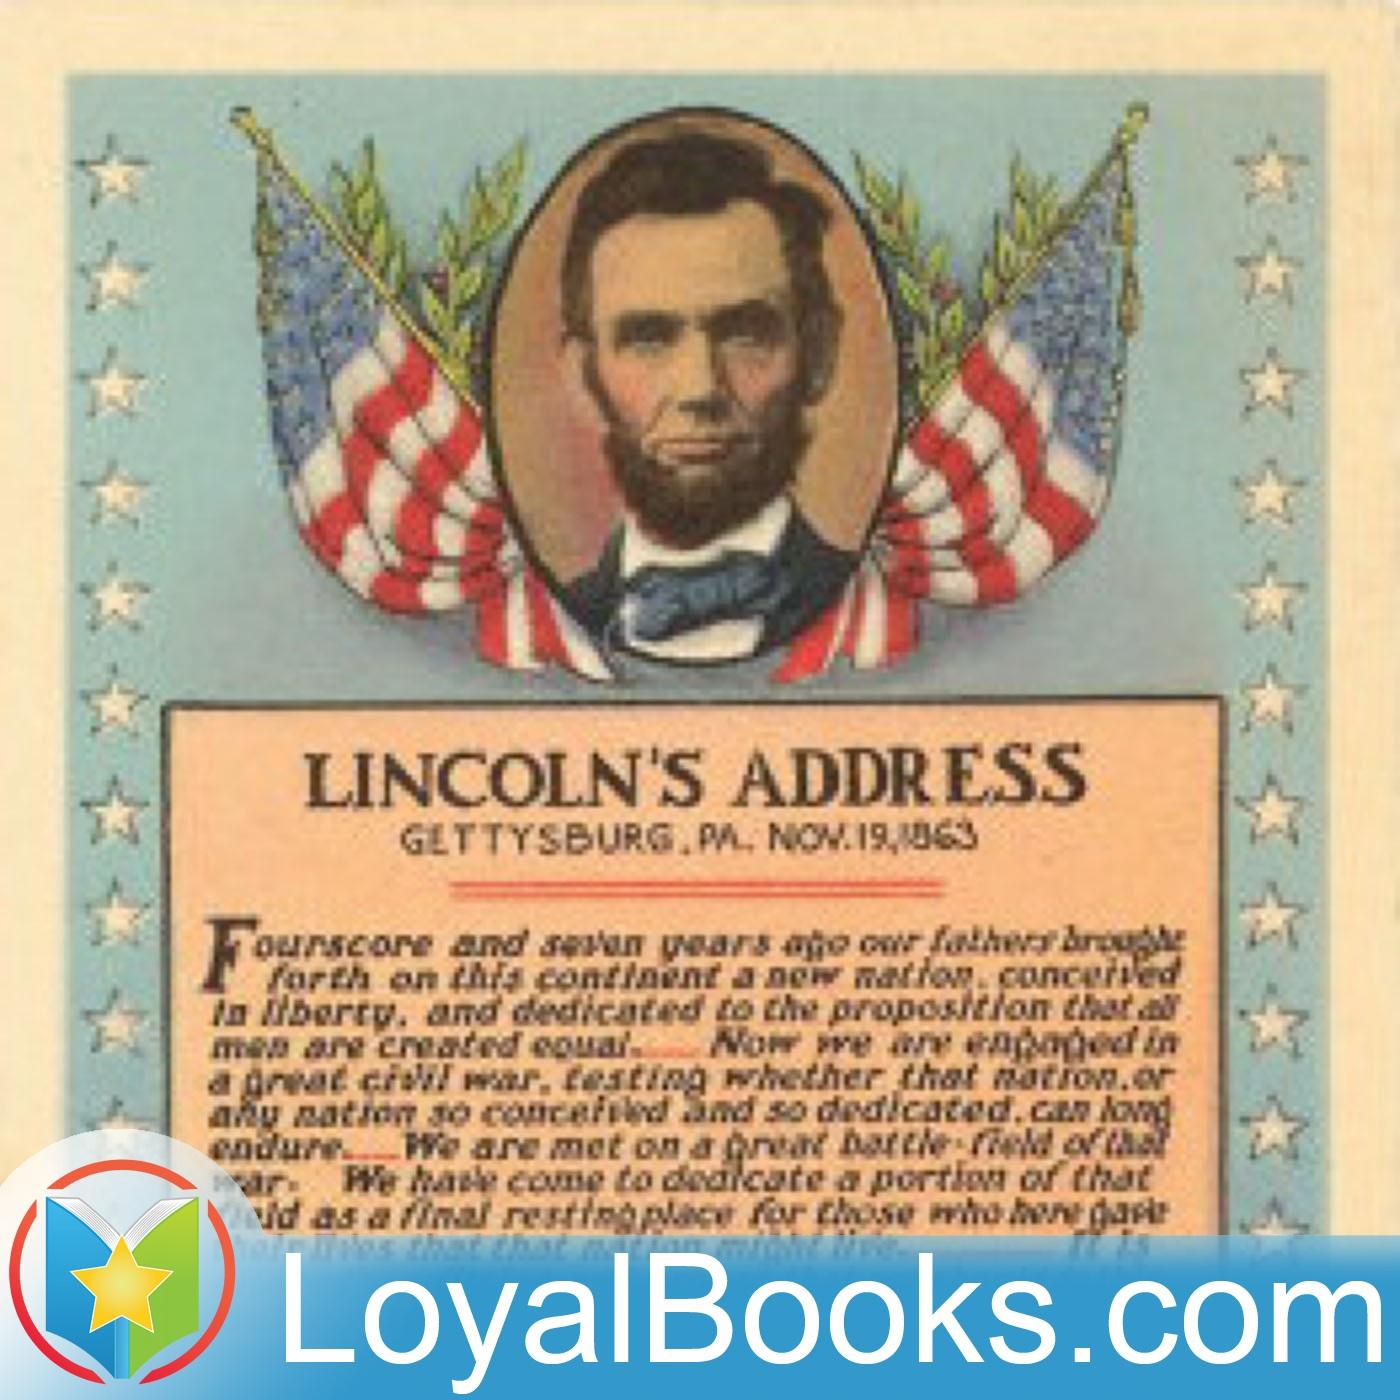 <![CDATA[The Gettysburg Address by Abraham Lincoln]]>